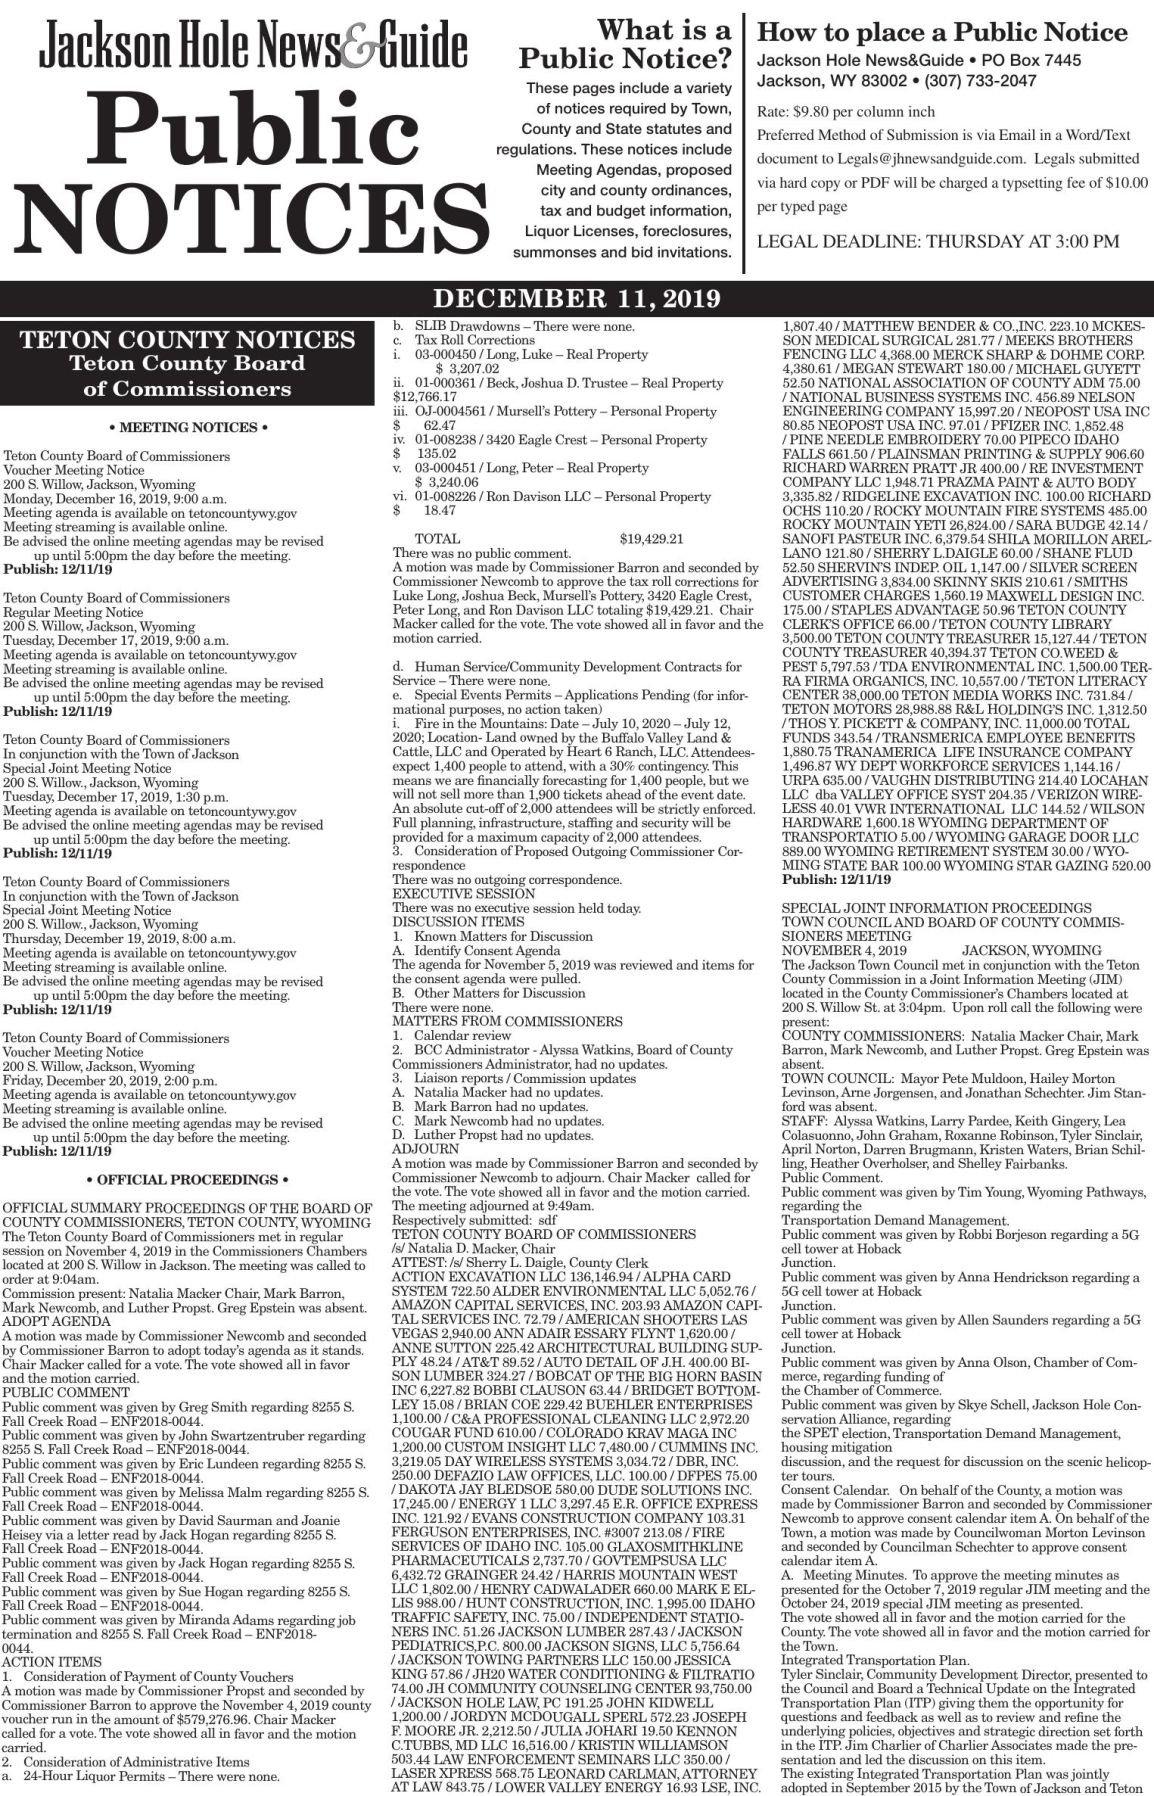 Public Notices, December 11, 2019